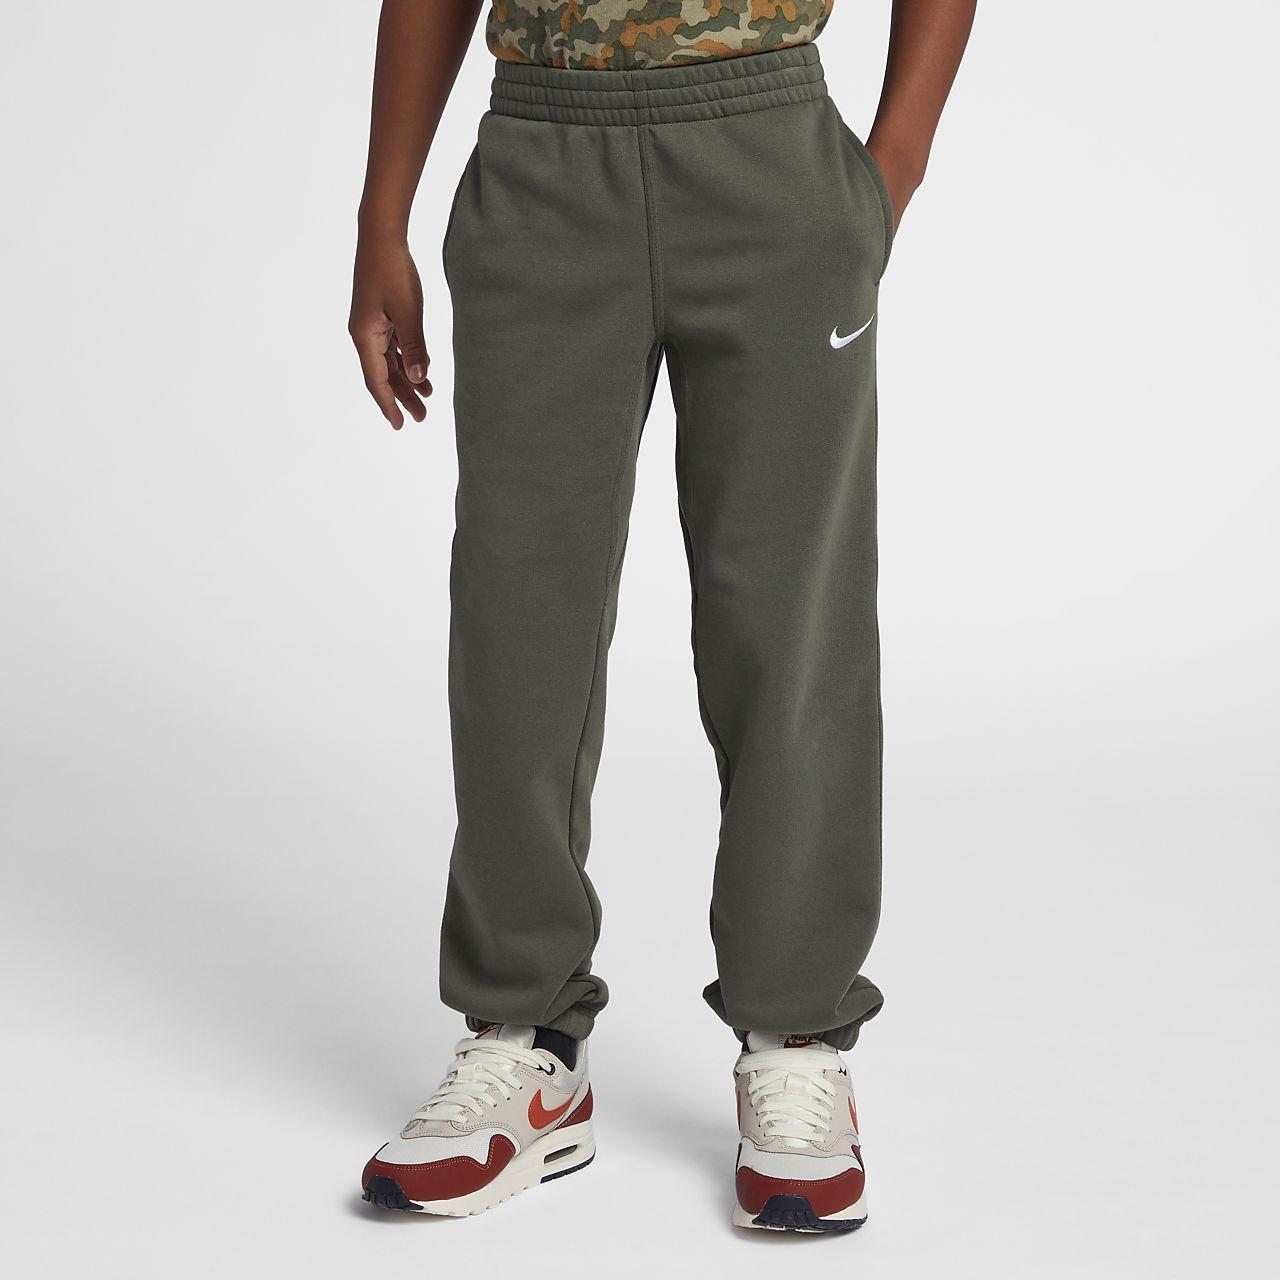 Joggingbroek Met Rits Jongens.Nike Brushed Fleece Cuffed Joggingbroek Jongens Nike Com Be